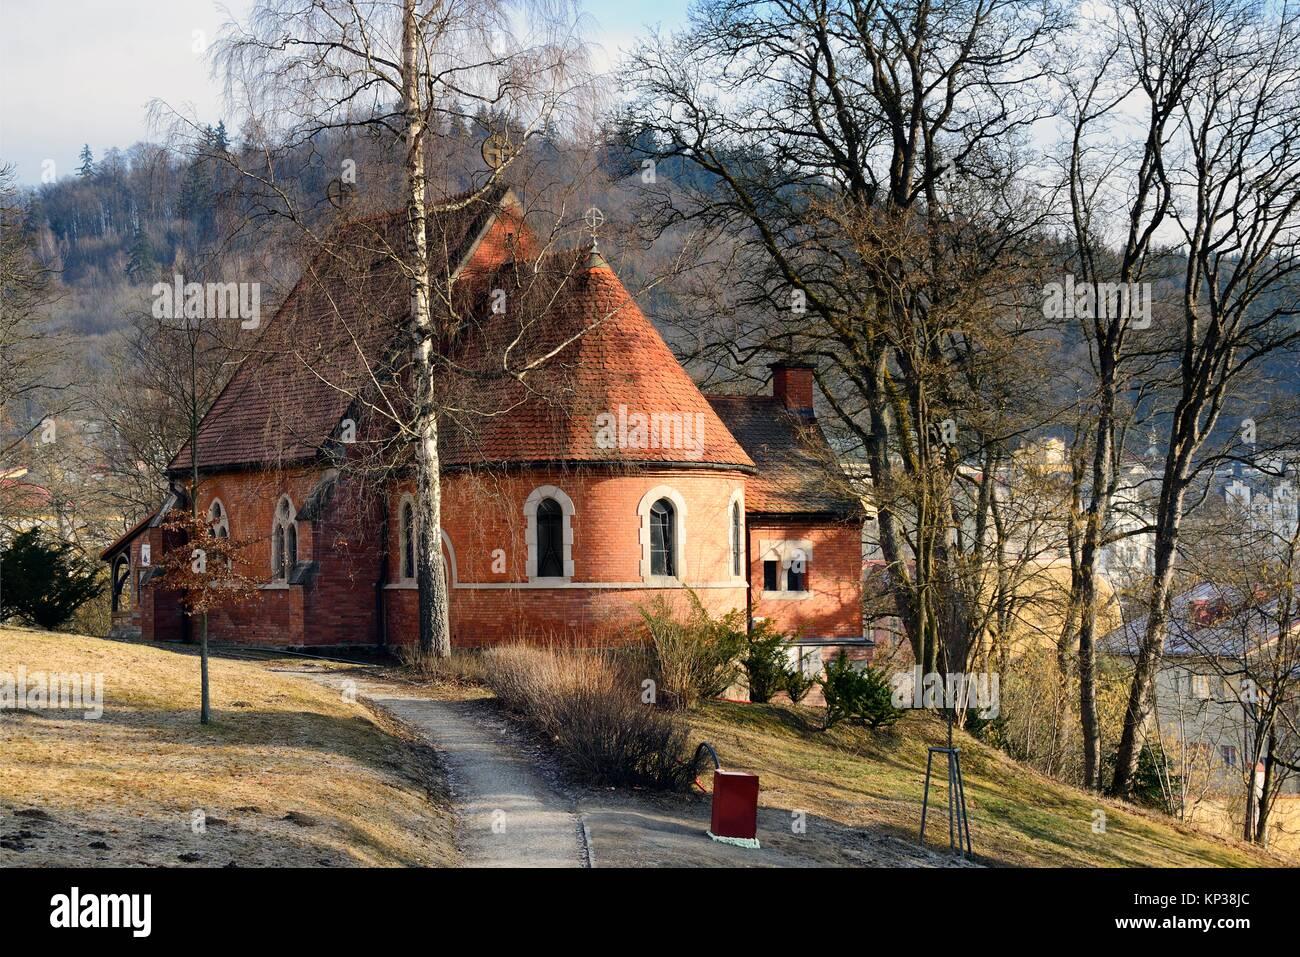 Anglican Church, Mariánské Lázne, Karlovy Vary Region, Bohemia, Czech Republic - Stock Image